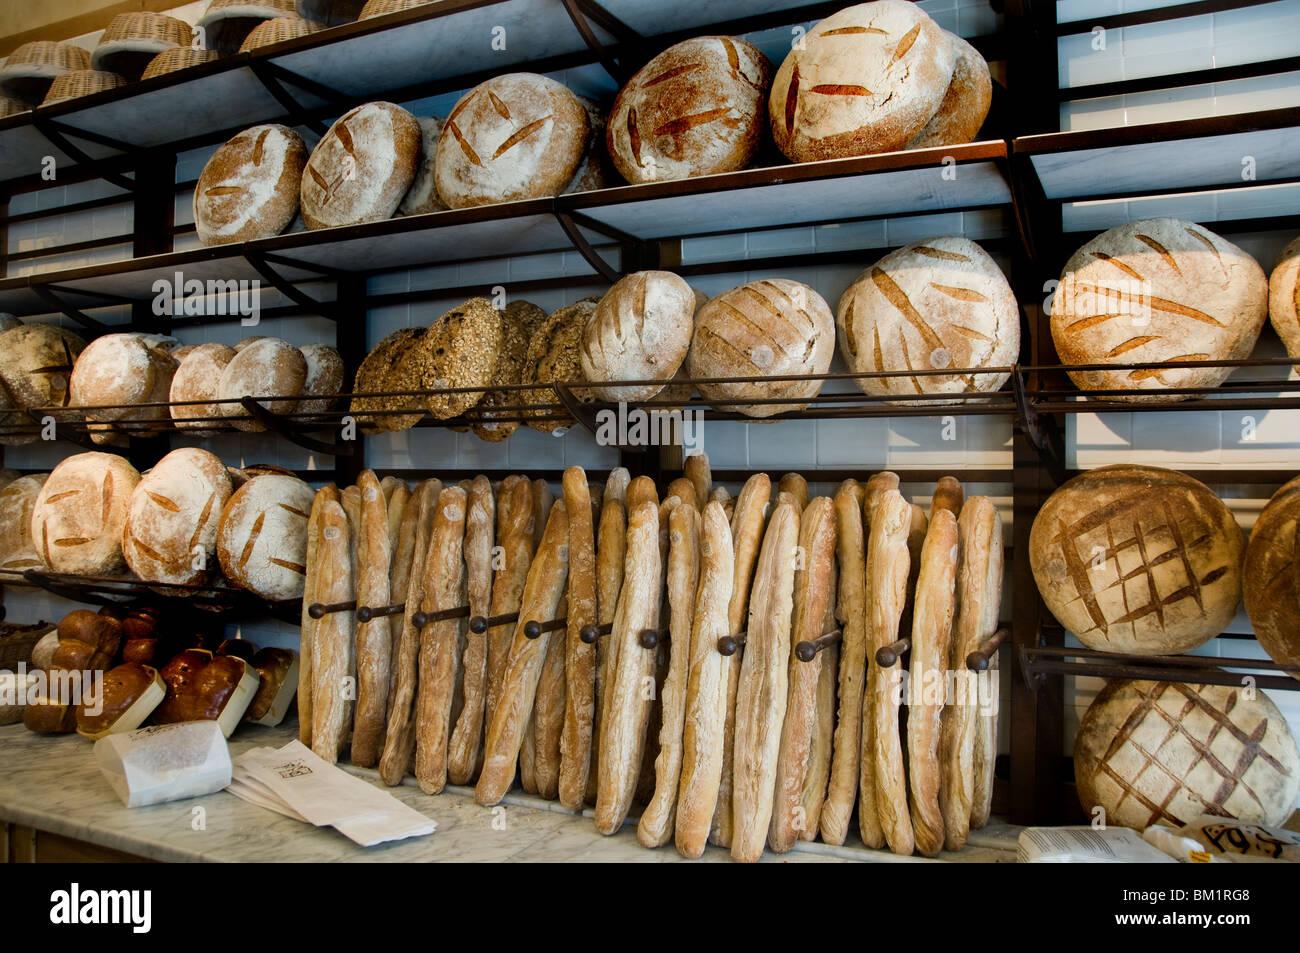 Bruxelles panetteria Boulangerie et tabella comune Bakkerij en Gemeenschappelijke Tafel Belgio Place de Grand Sablon Immagini Stock